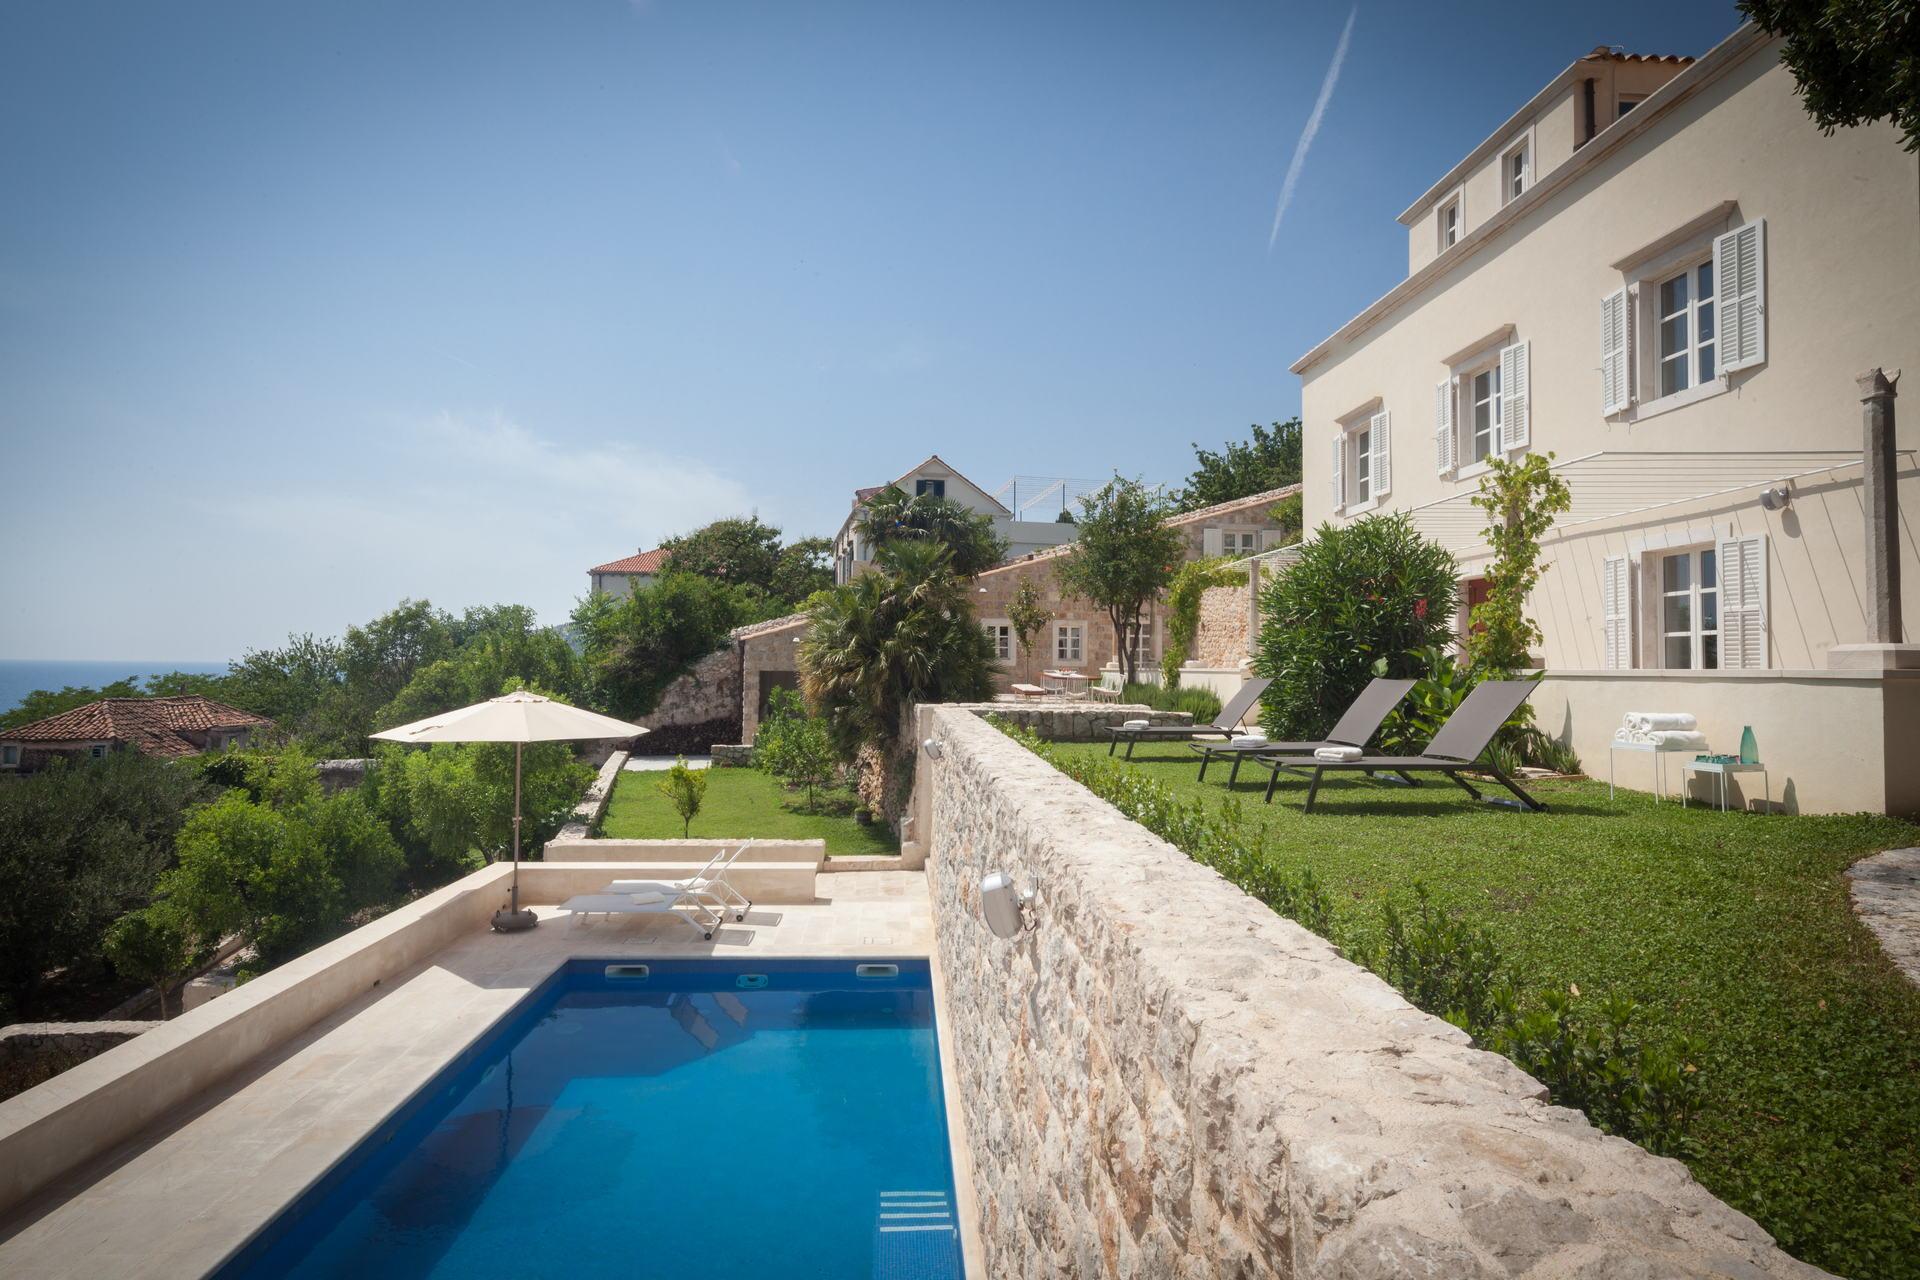 Villa My Way Palace with Swimming Pool